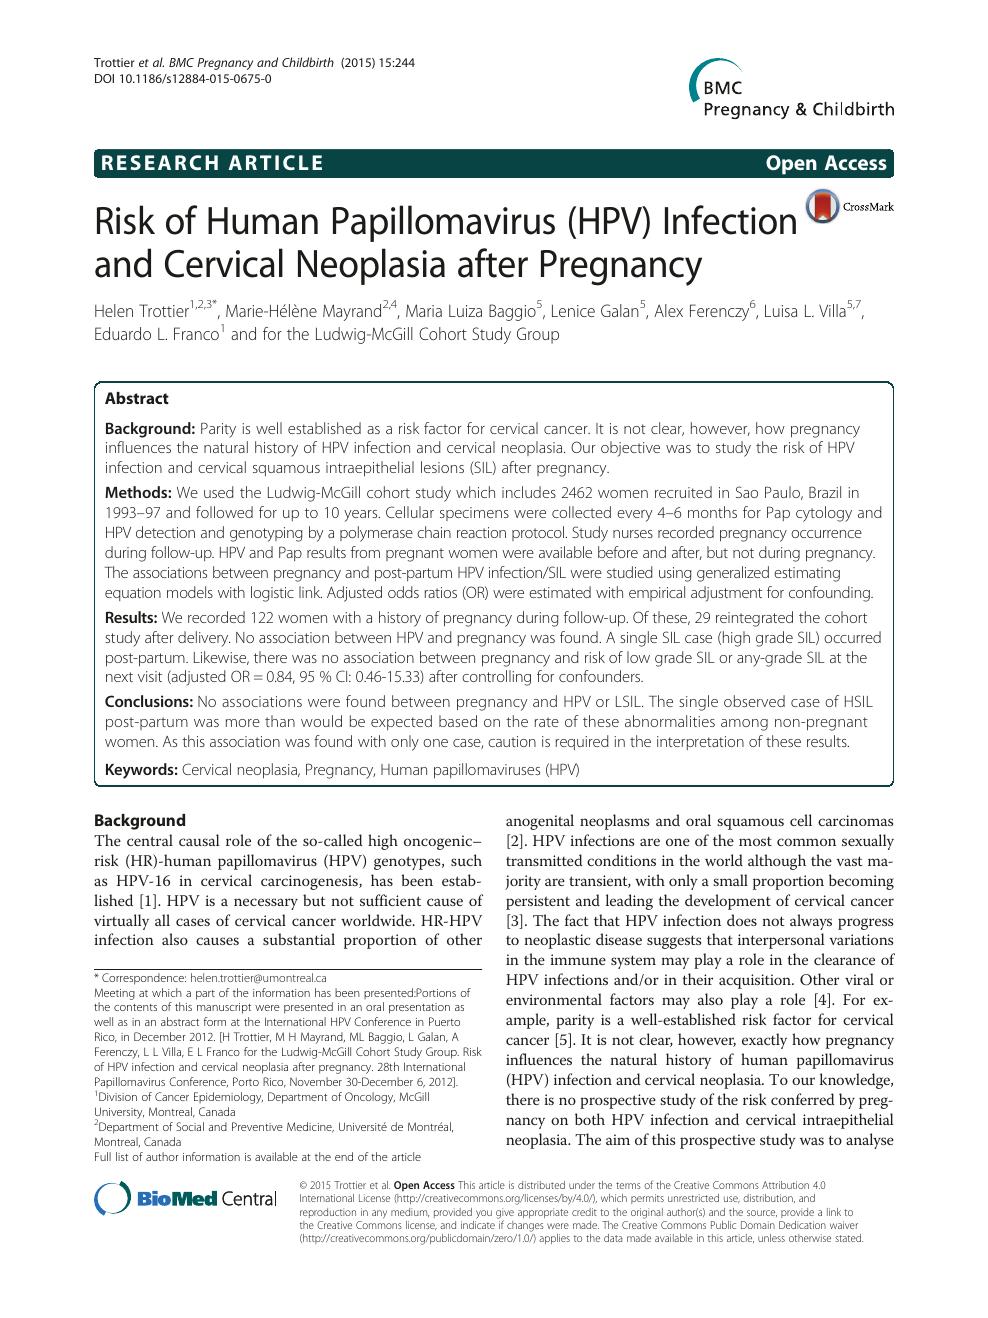 Human papillomavirus pregnant